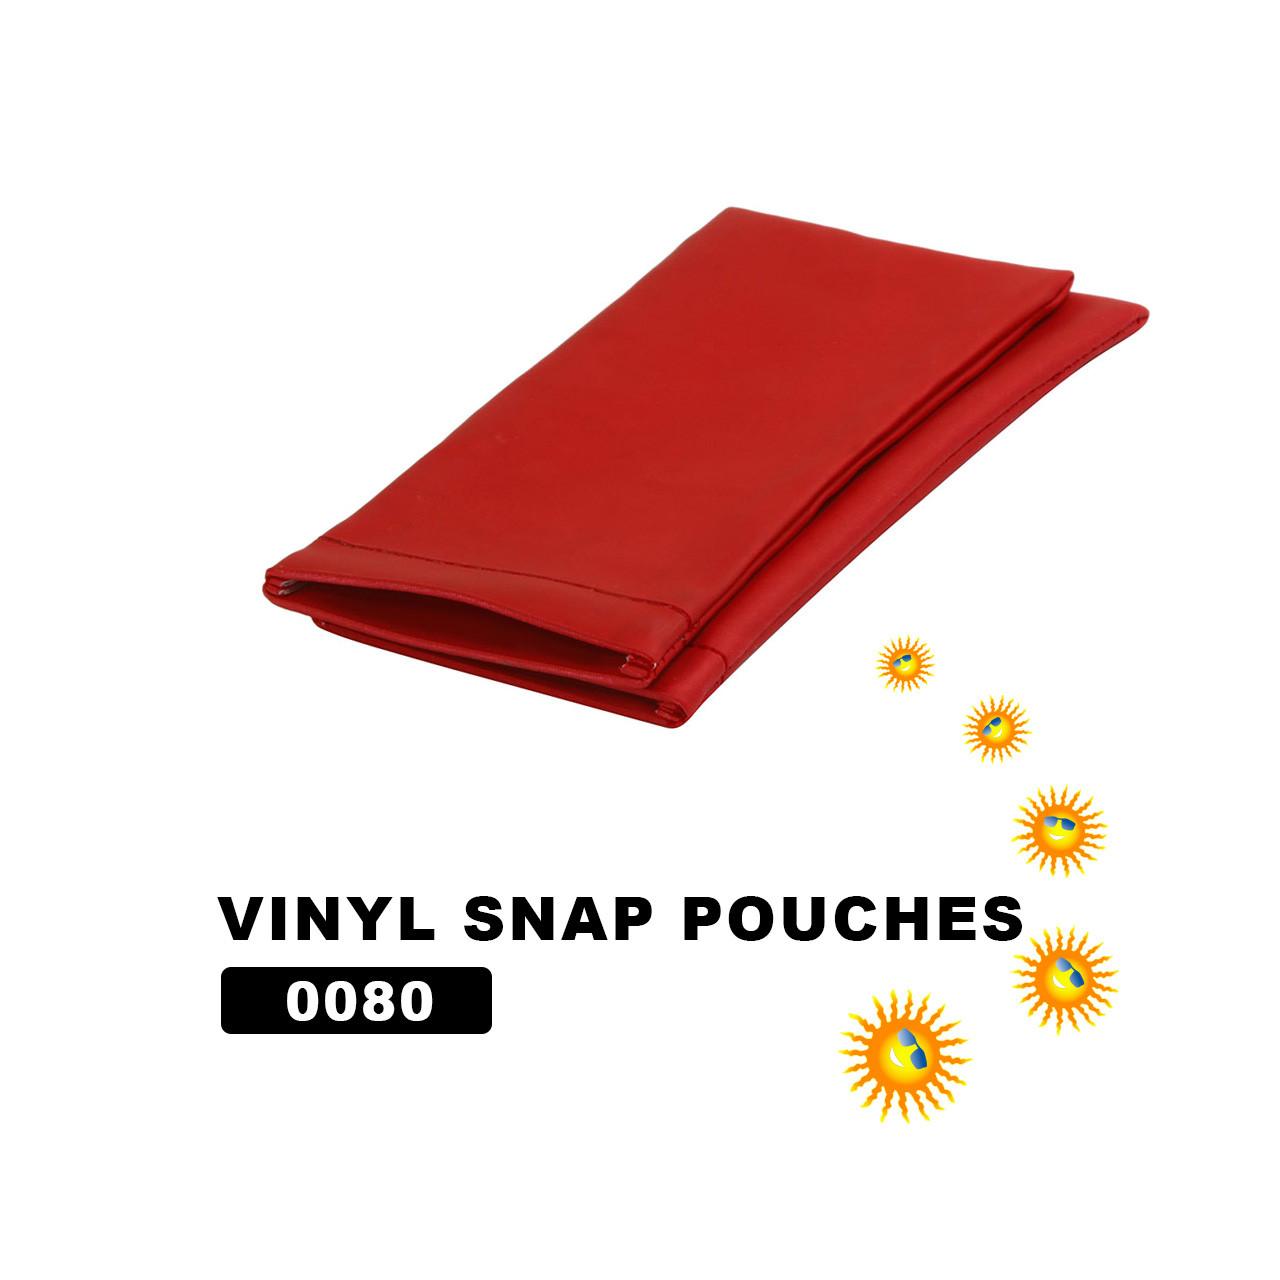 Wholesale Vinyl Snap Pouches ~ Red ~ 0080